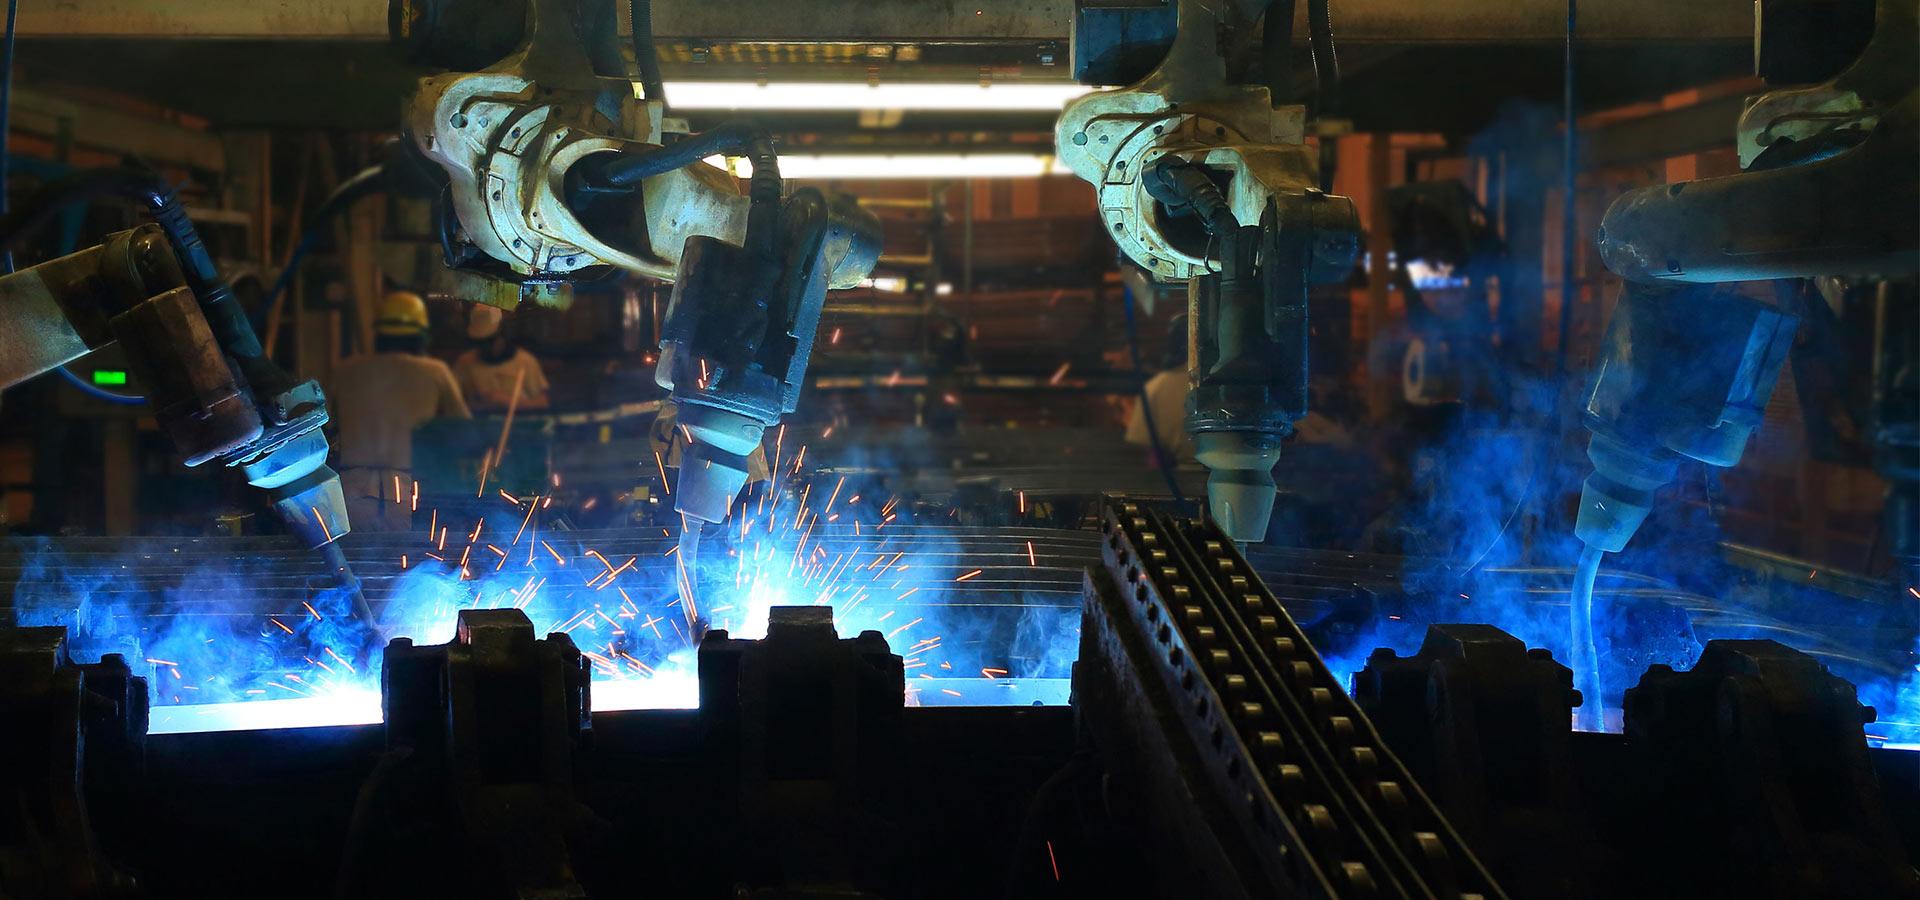 elca-sa-proyectos-ingenieria-automatizacion-vitoria